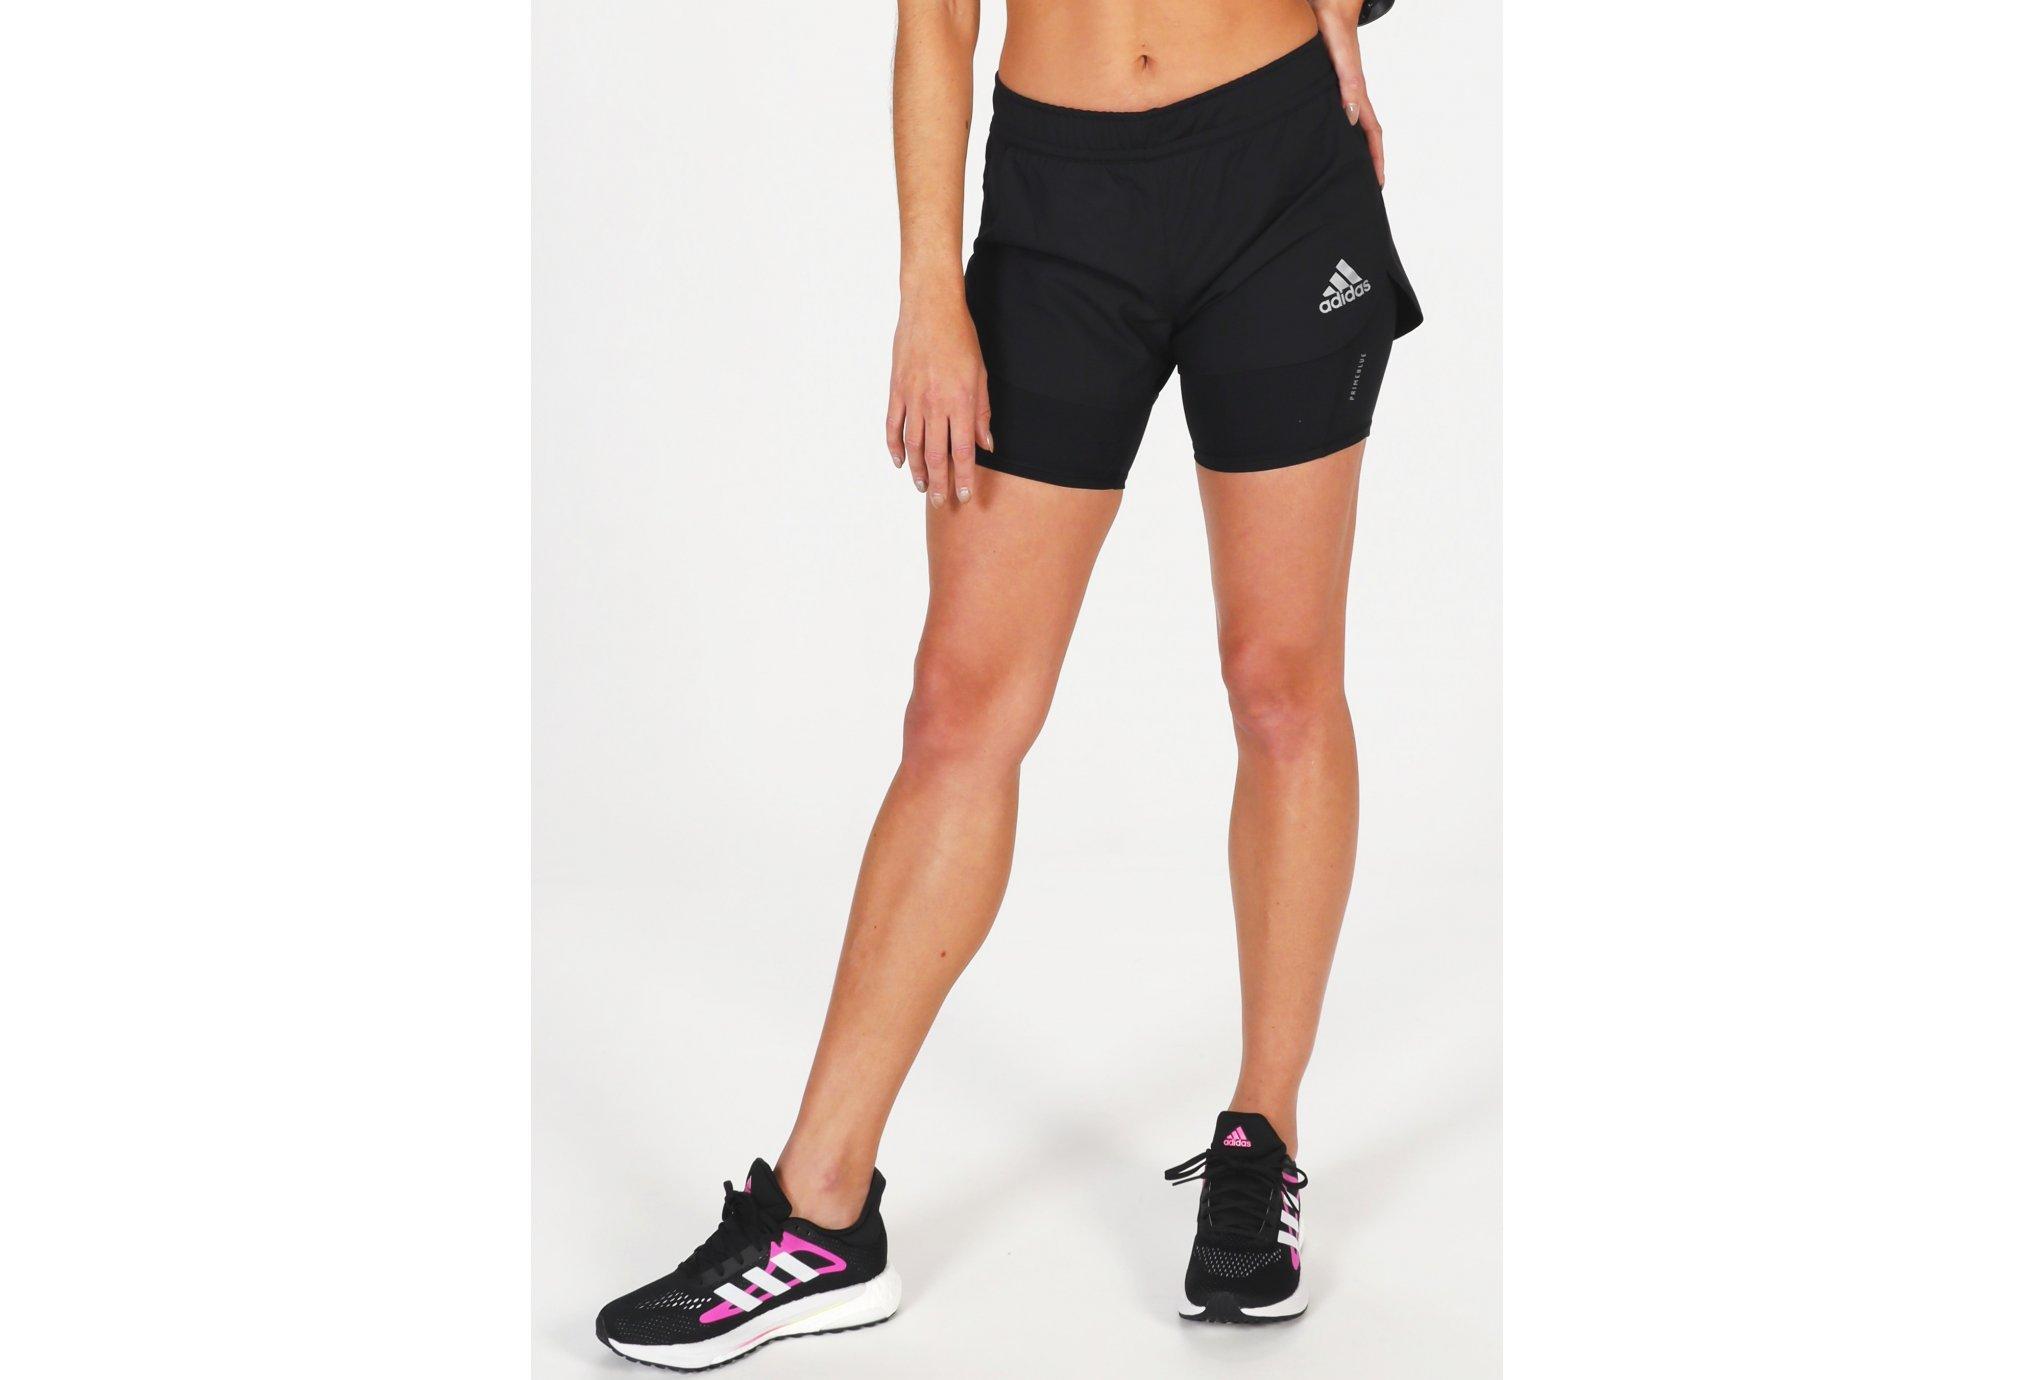 adidas Fast 2 In 1 Primeblue W vêtement running femme